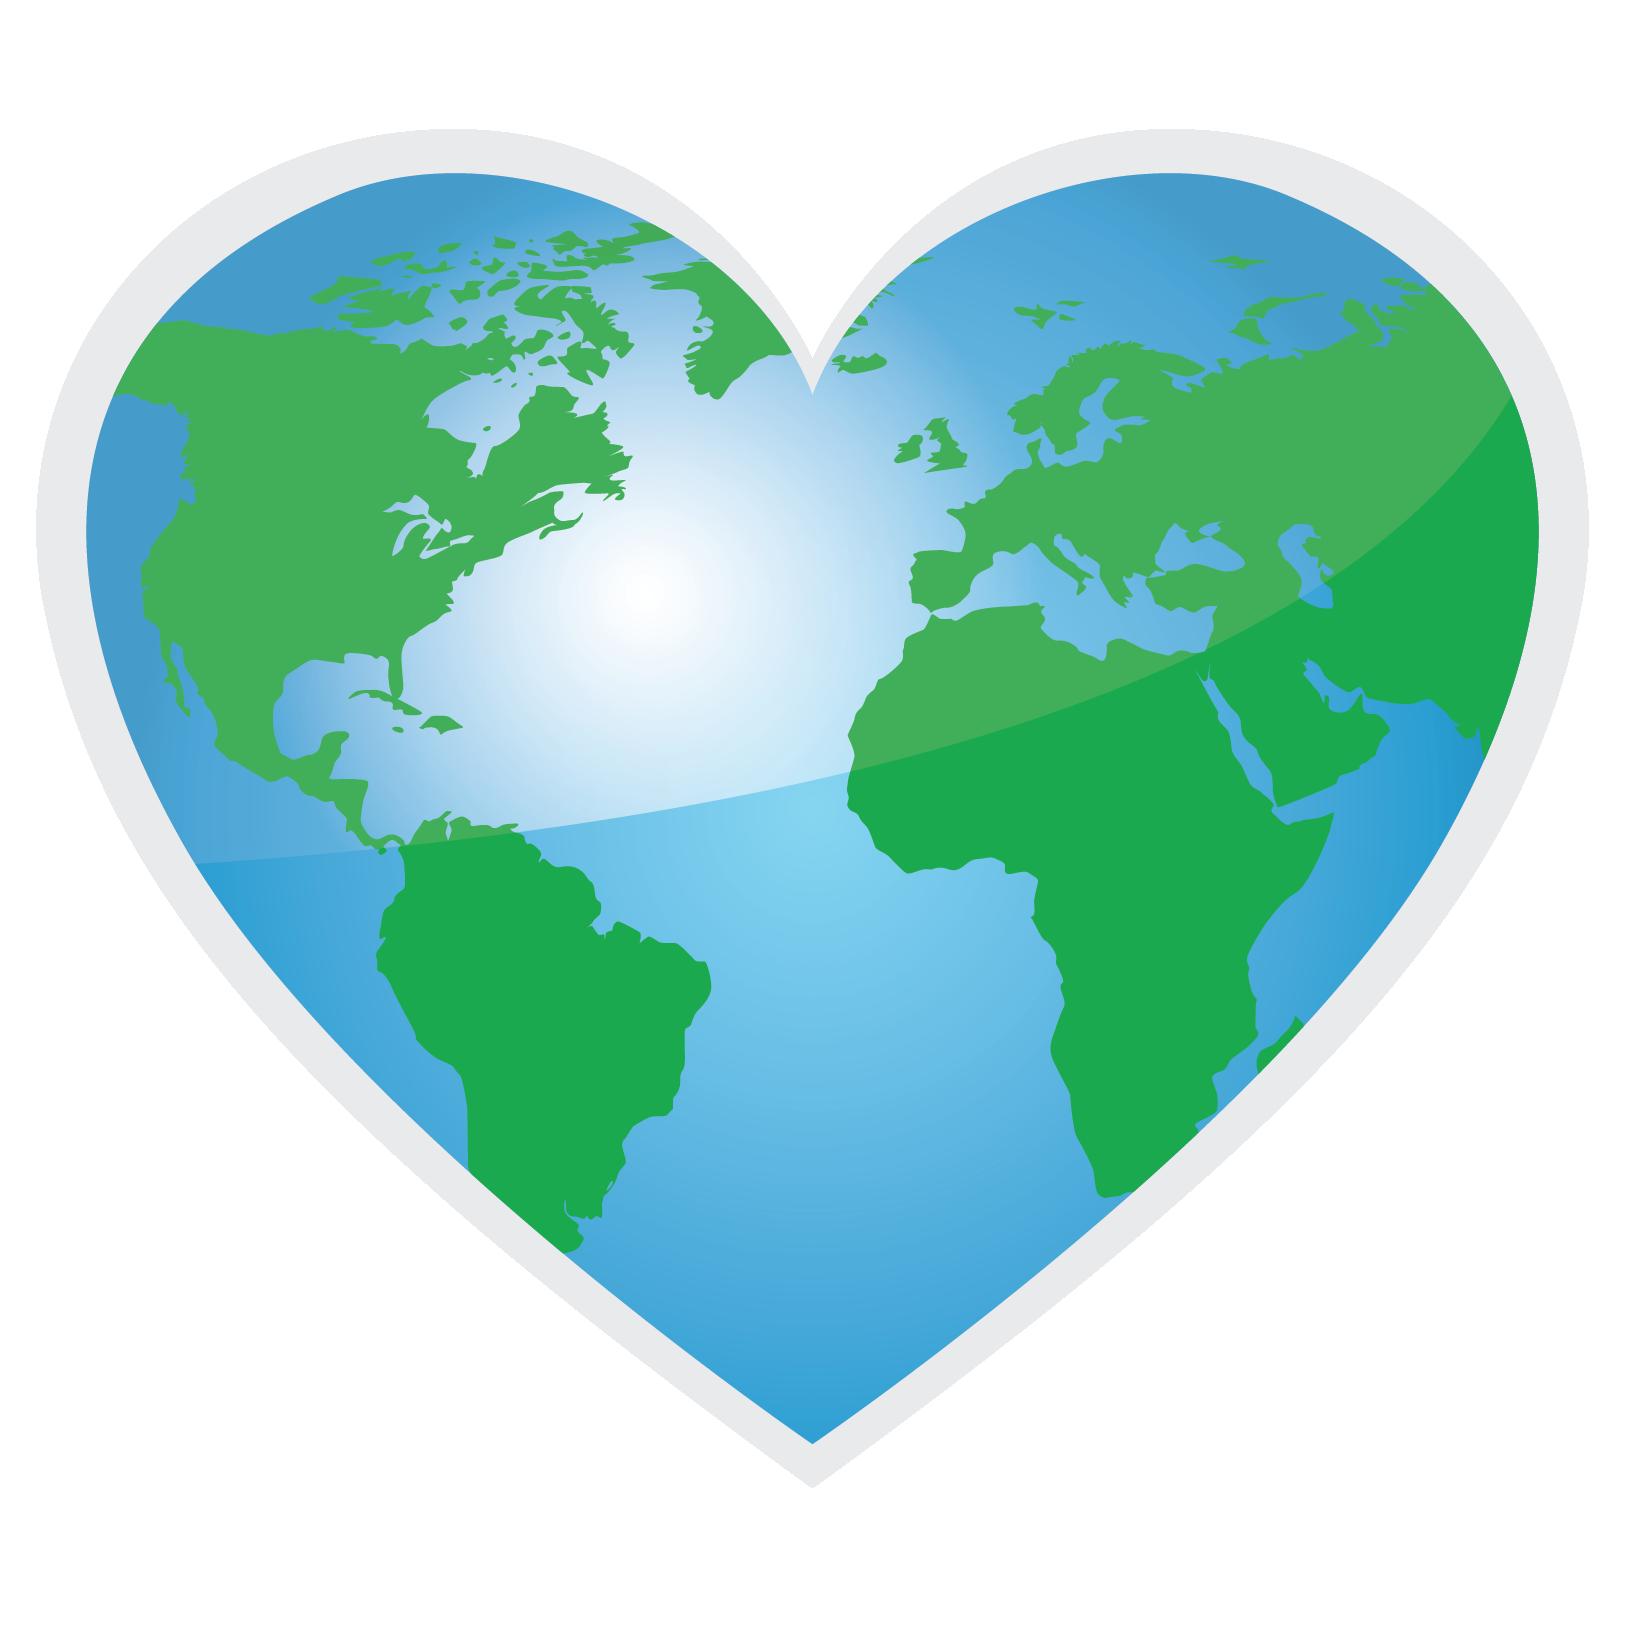 Download logos tpwf dpi. Clipart world heart